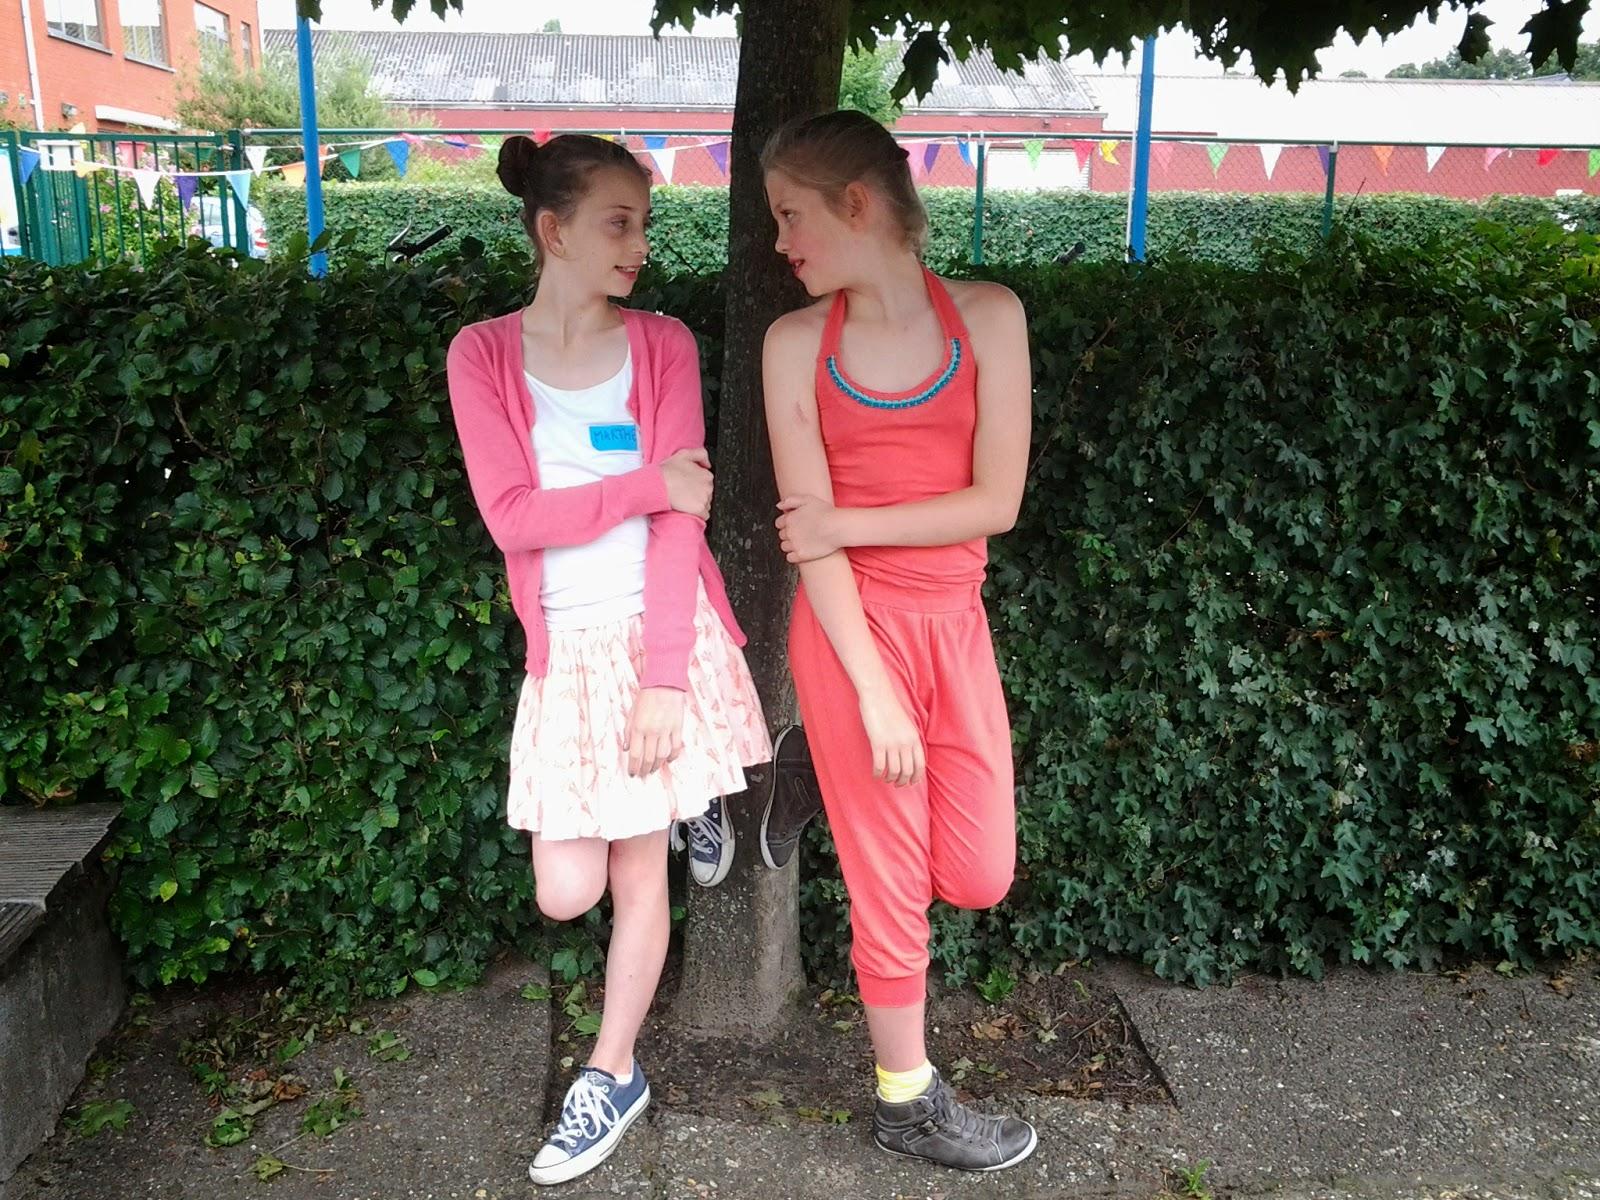 Meiden spelletjes flirten op school